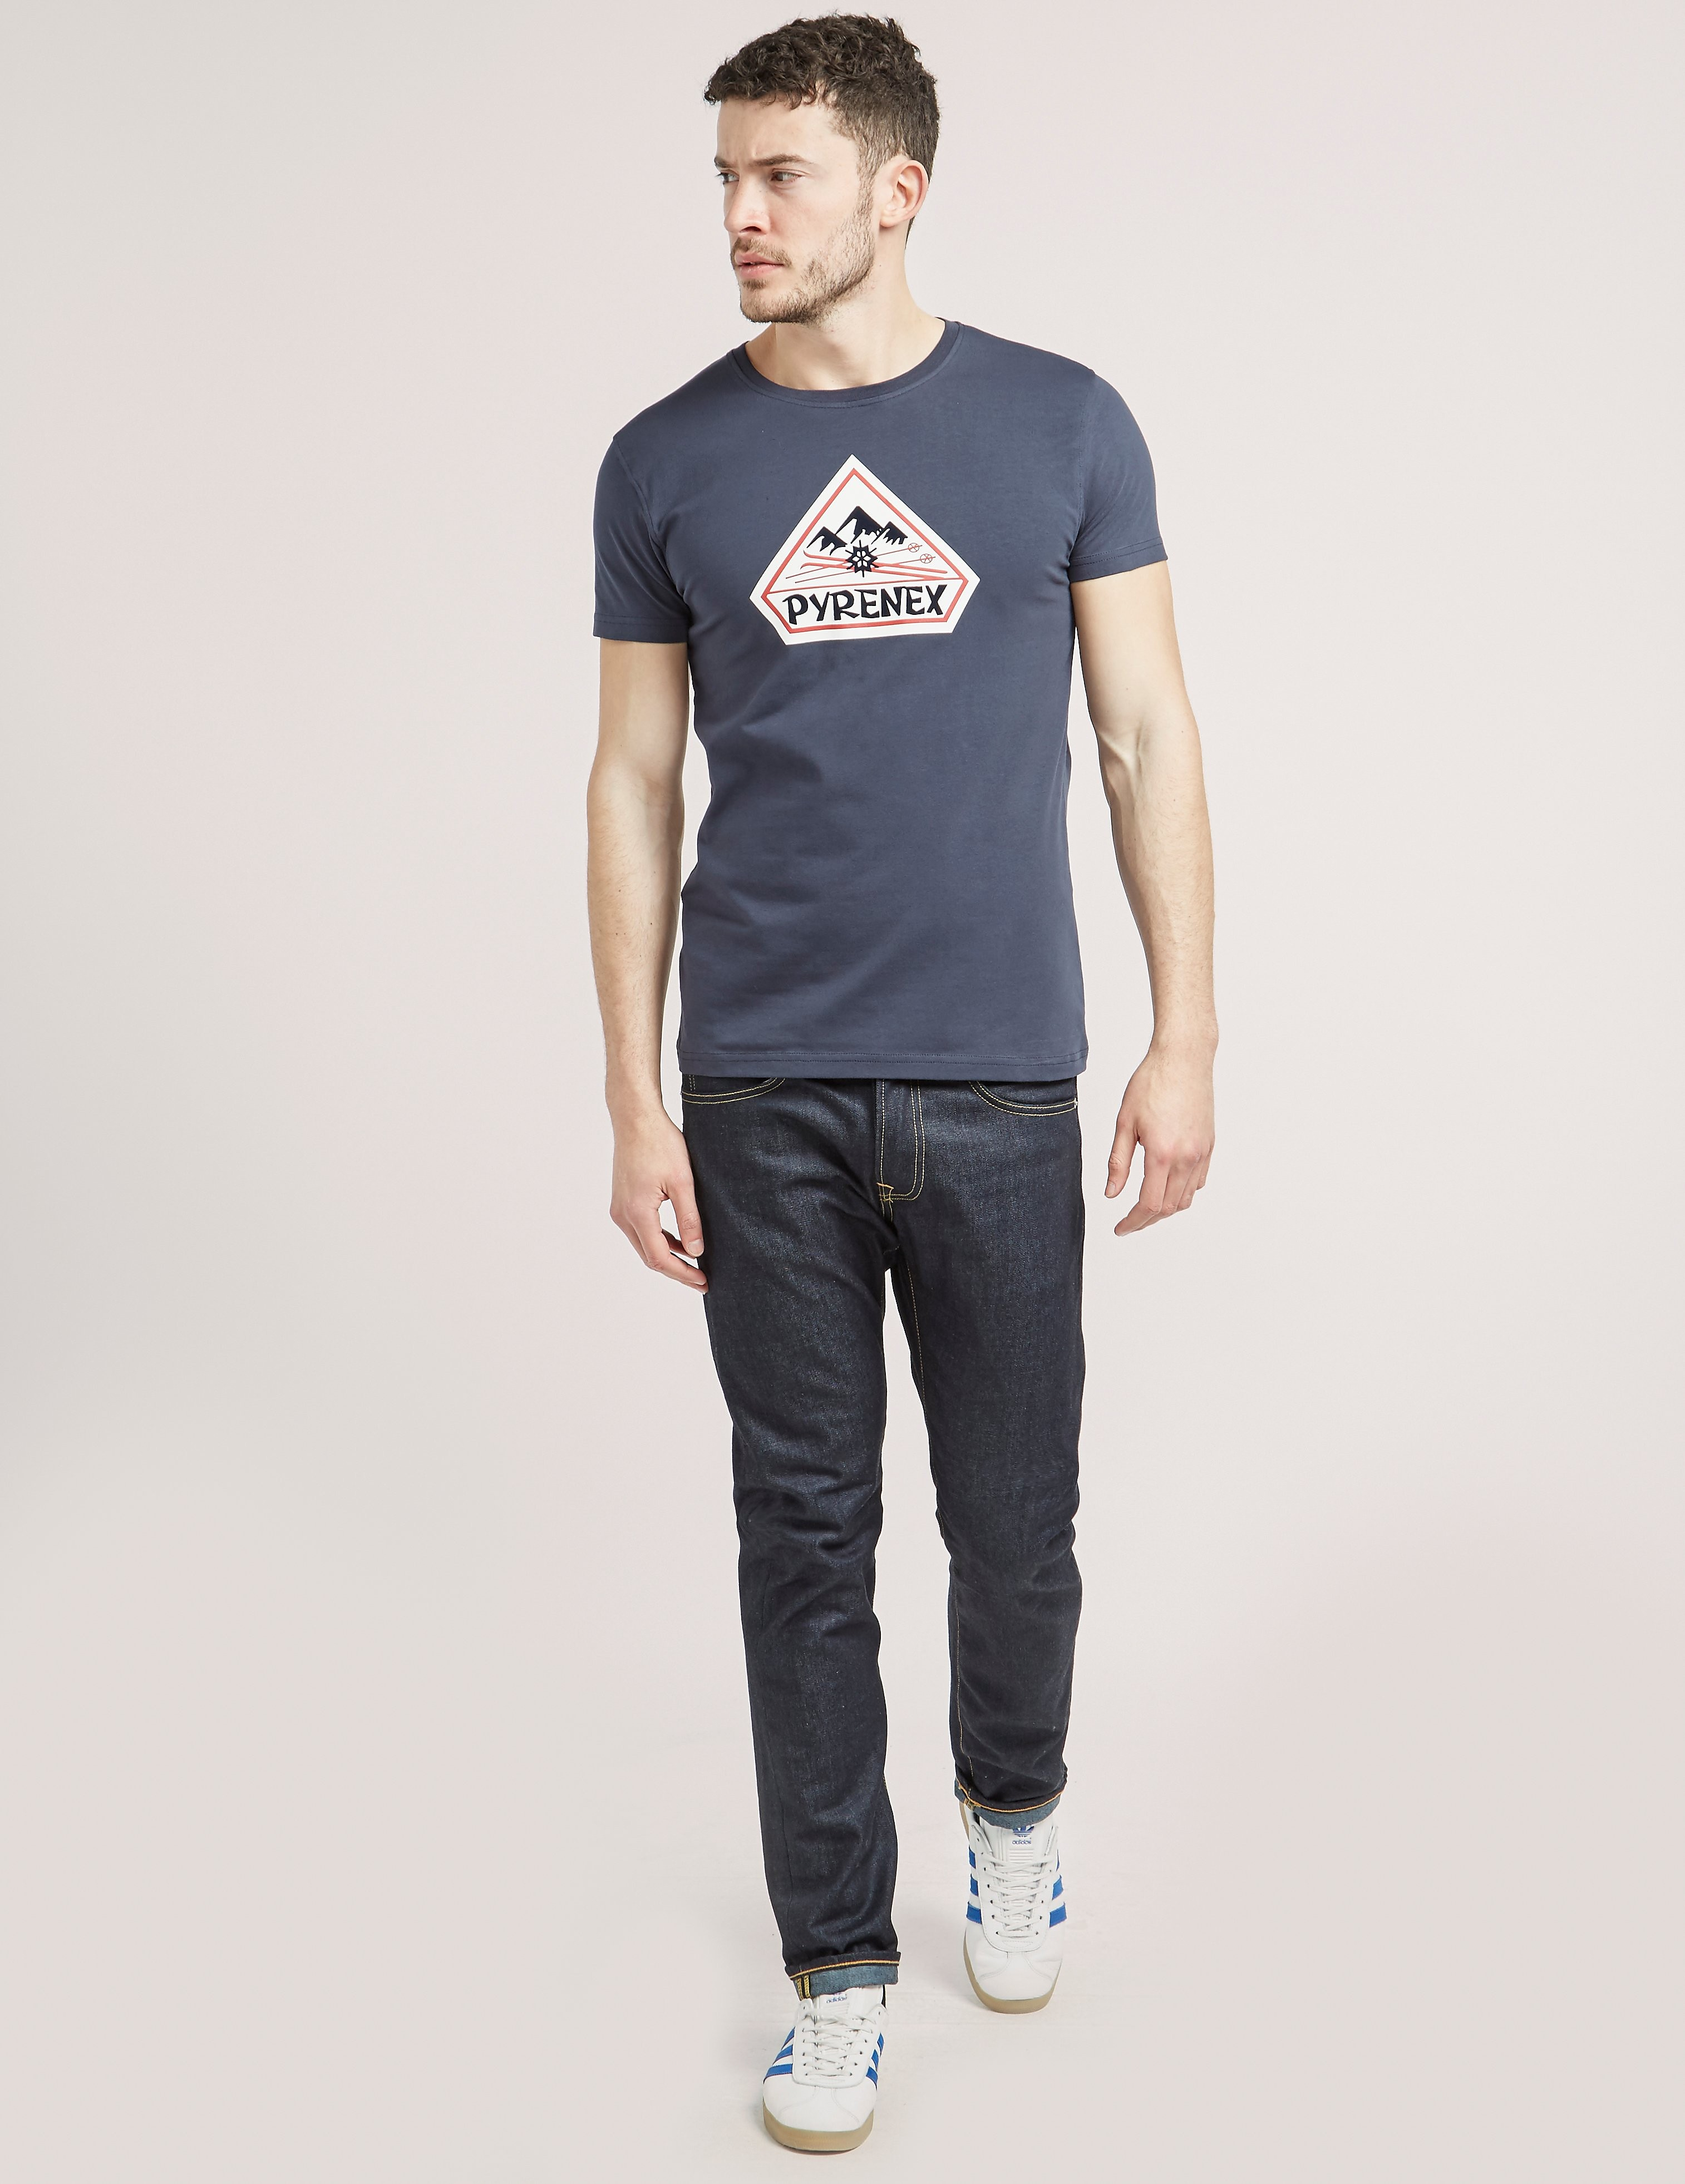 Pyrenex Short Sleeve Print T-Shirt